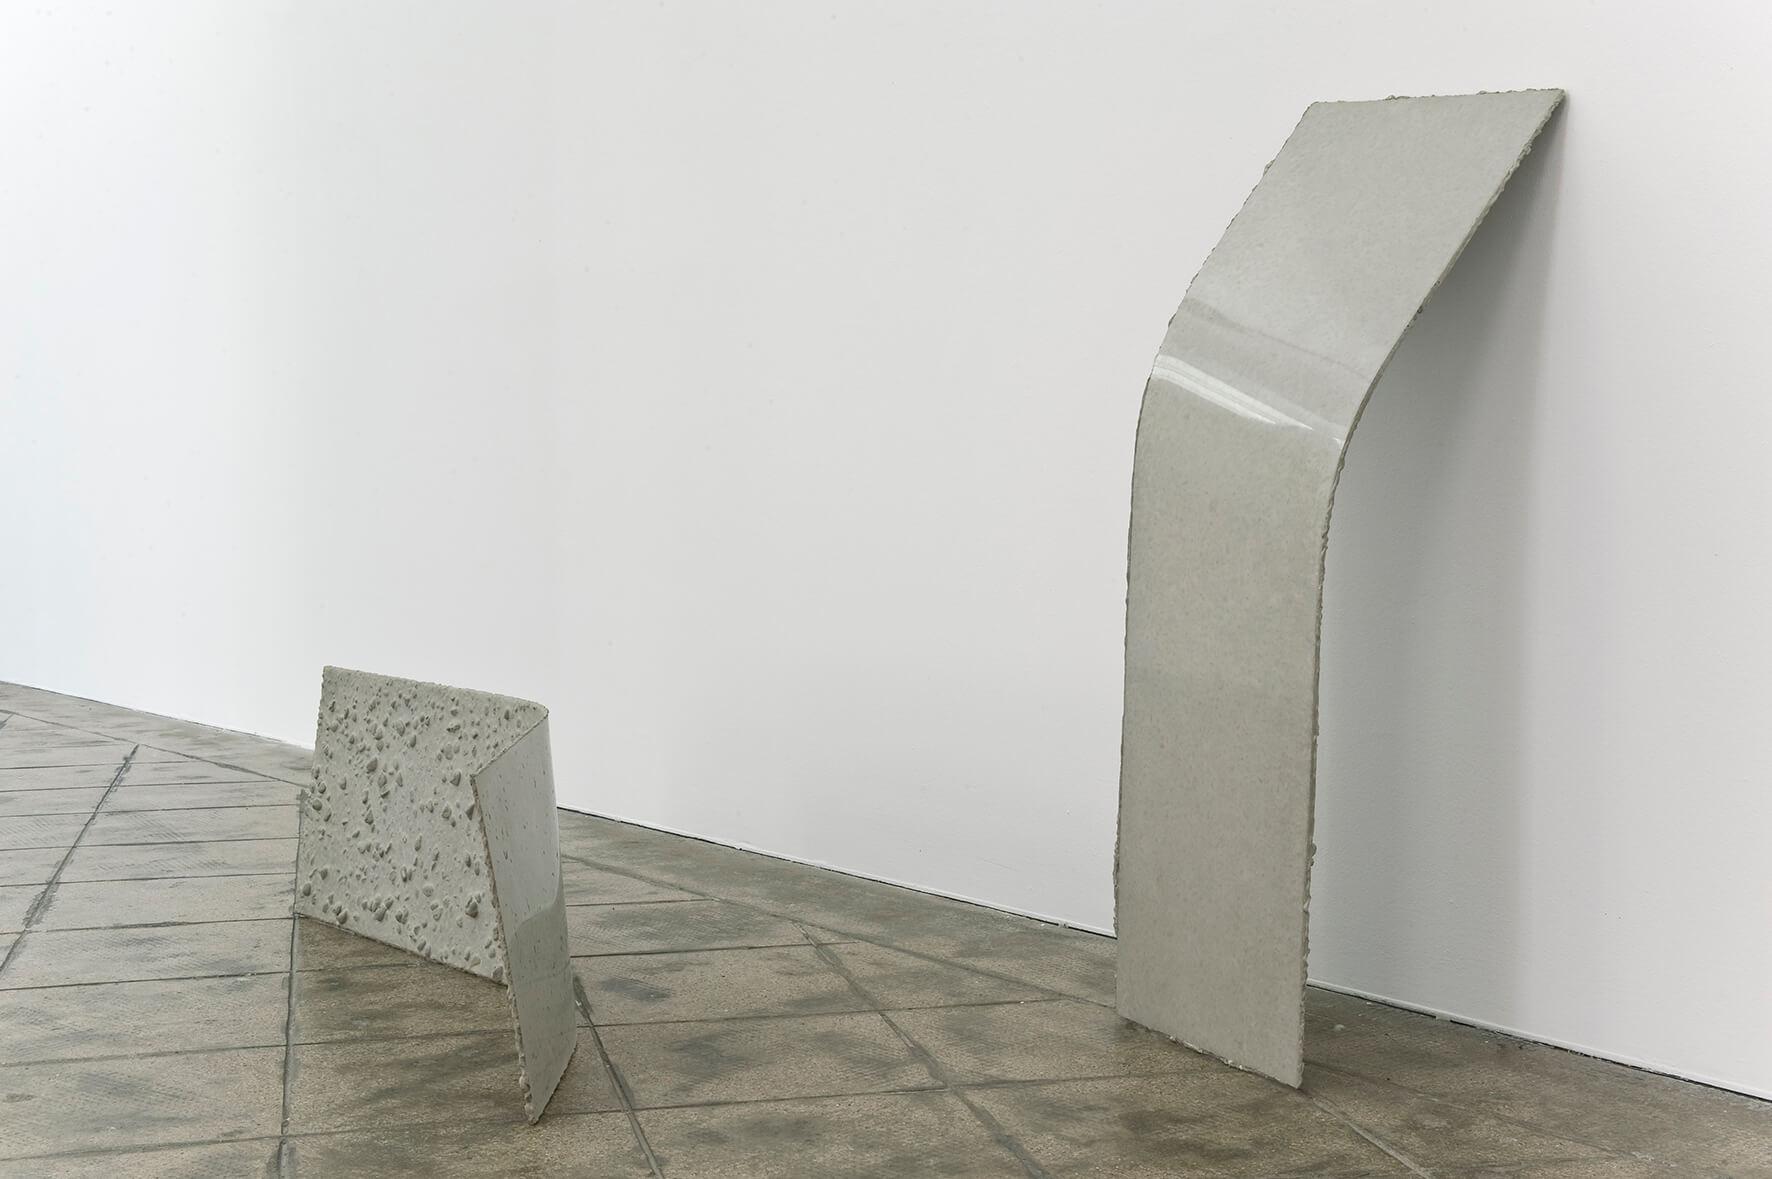 Installation view: 10, 25, 80, ProjecteSD | 10, 25, 80 | ProjecteSD